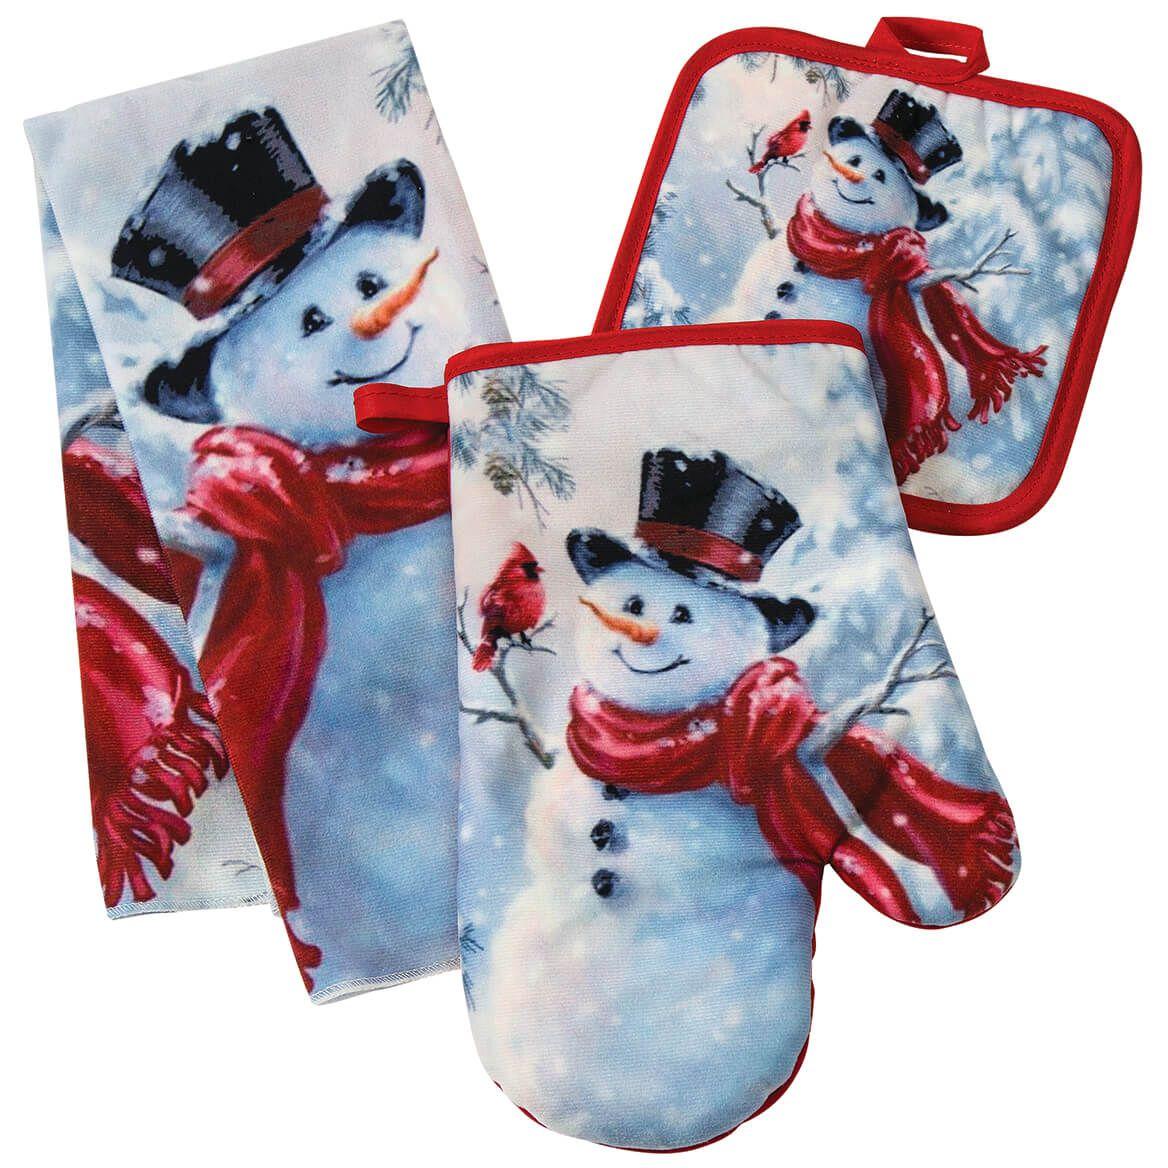 Snowman and Cardinal Christmas Towel and Potholder Set of 3-372216